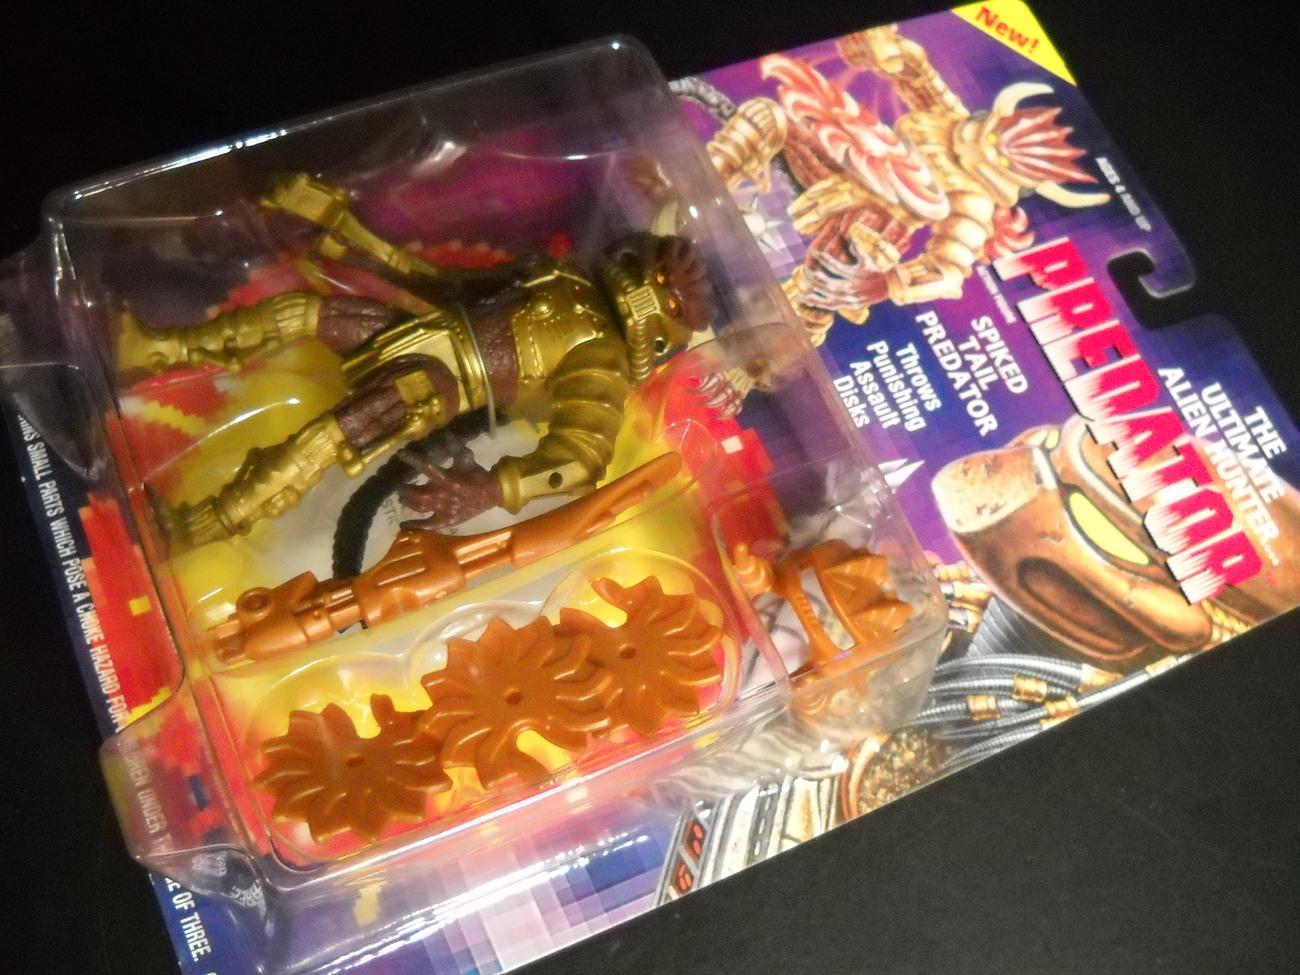 Kenner Predator 1994 Spiked Tail Predator Assault Discs Factory Sealed on Card